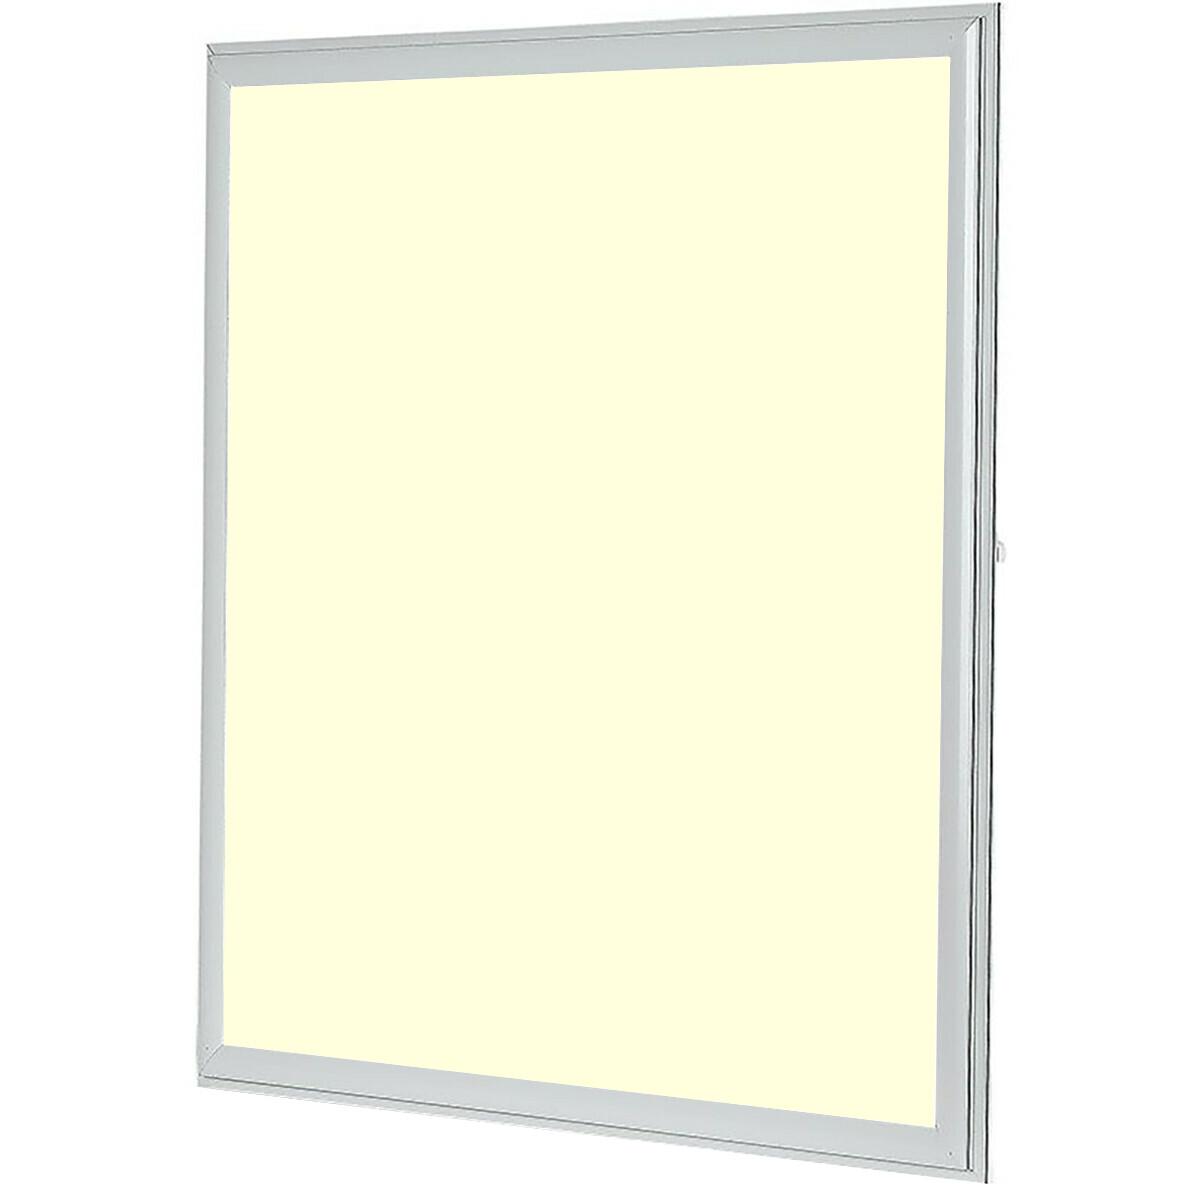 LED Paneel - Viron Ganto - 60x60 Warm Wit 3000K - 45W Inbouw Vierkant - Mat Wit - Aluminium